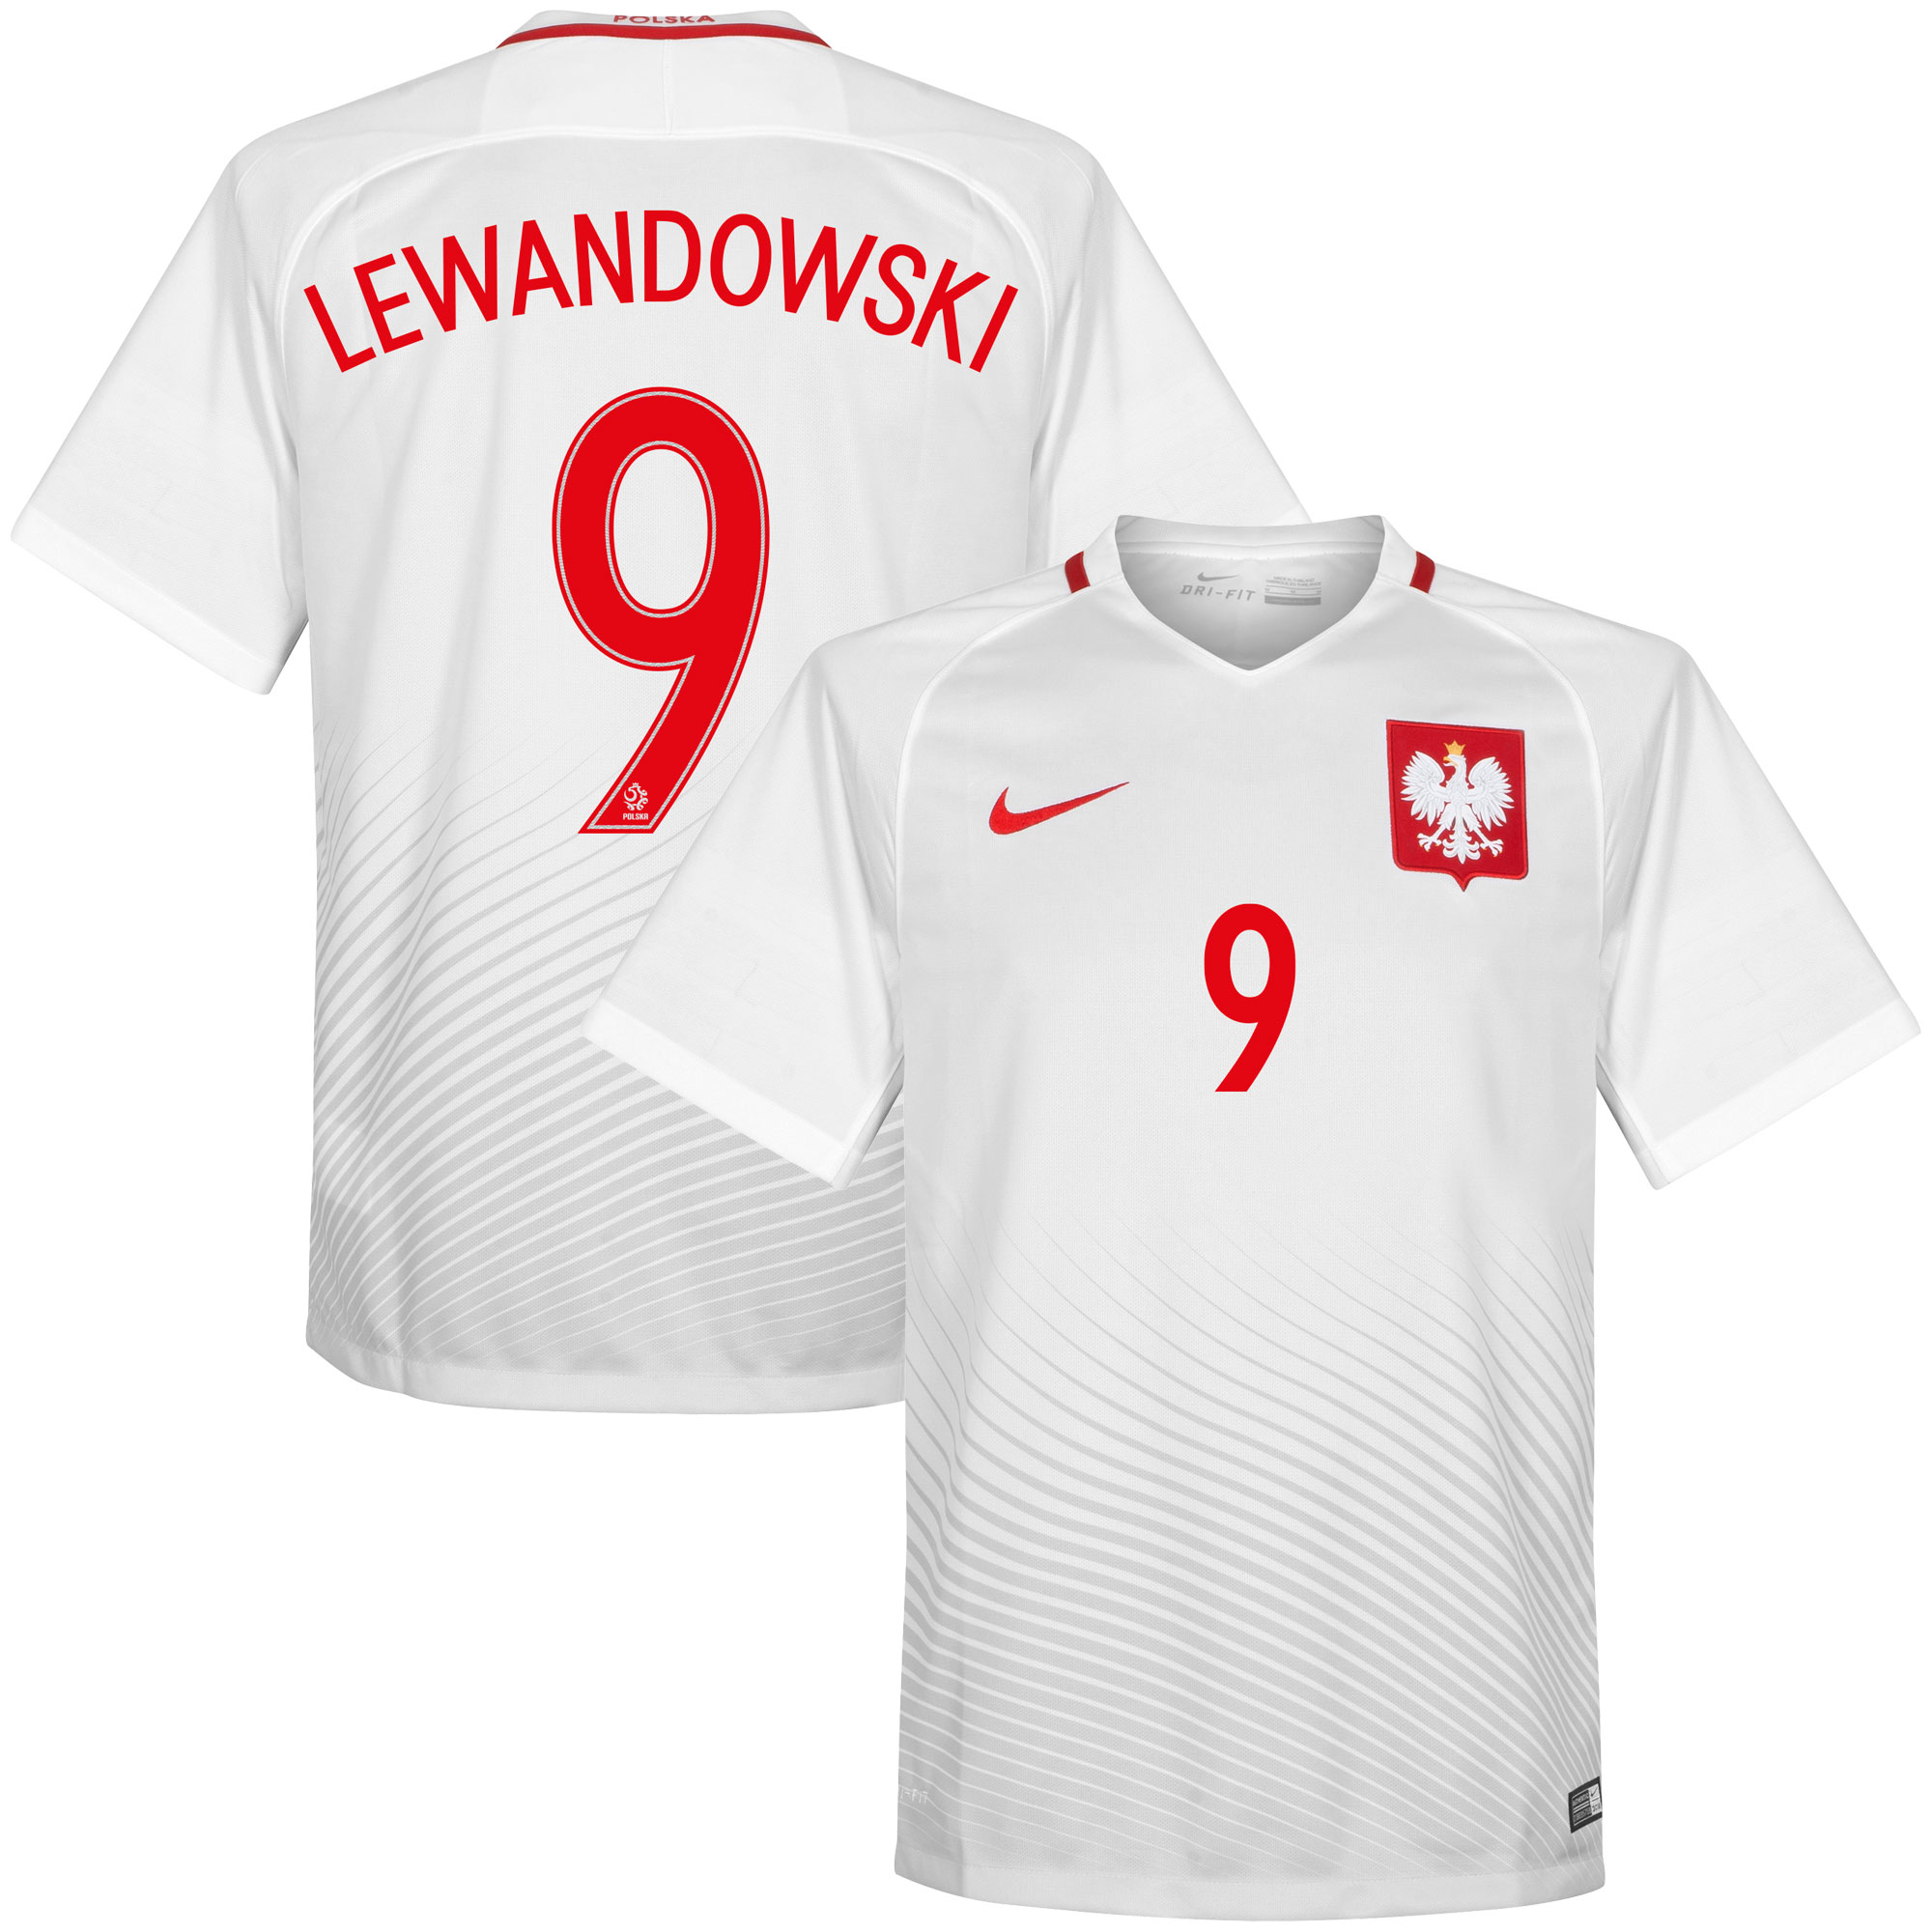 Poland Home Lewandowski Jersey 2016 / 2017 (Official Printing) - XXL